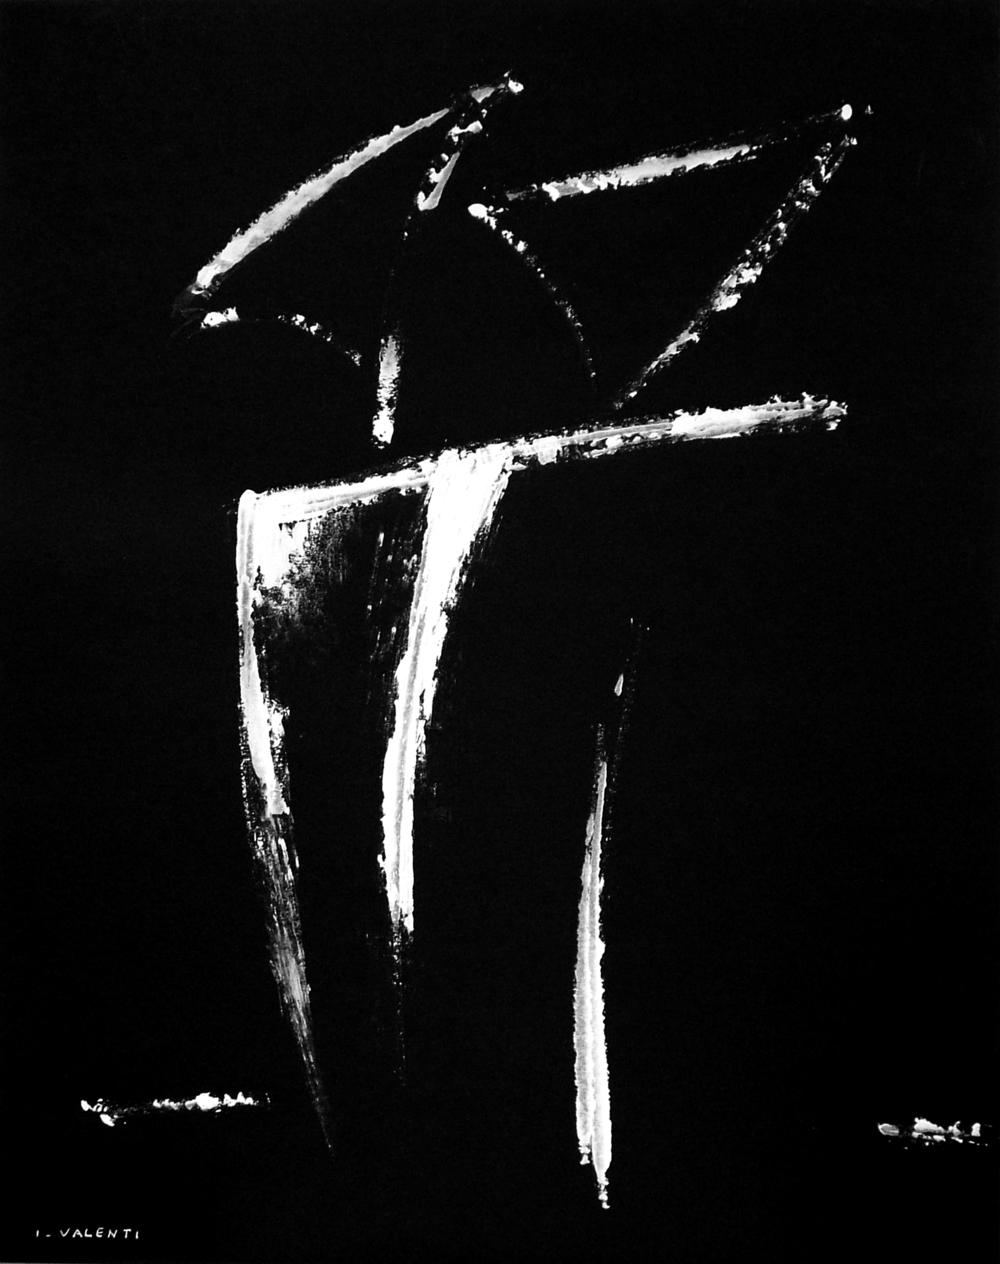 Troubadours cm 60x48 acquerello.jpg